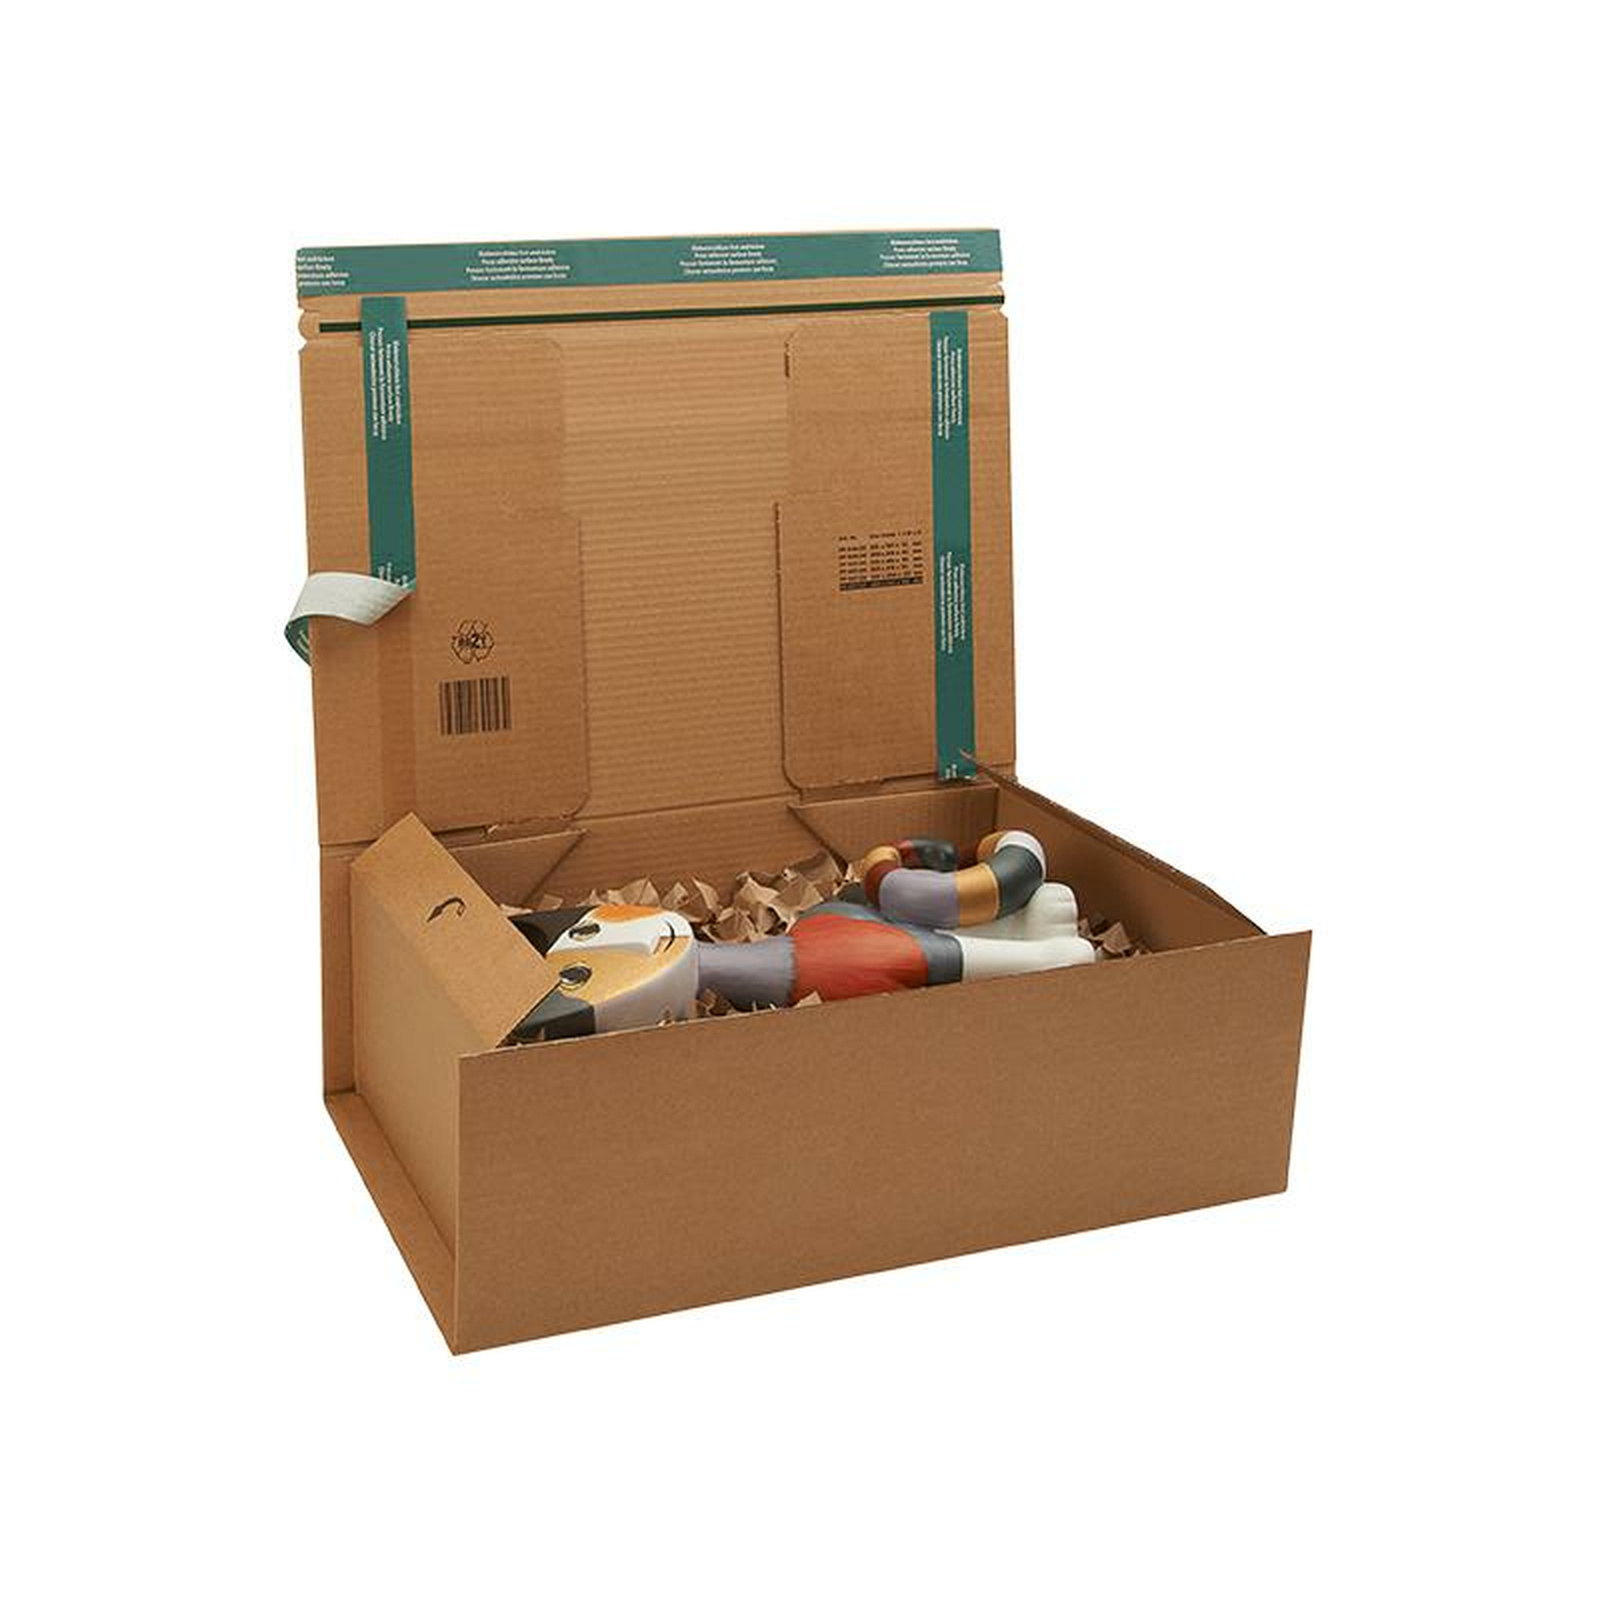 post versandkartona5 230x166x90 mm g nstig kaufen 0 64. Black Bedroom Furniture Sets. Home Design Ideas